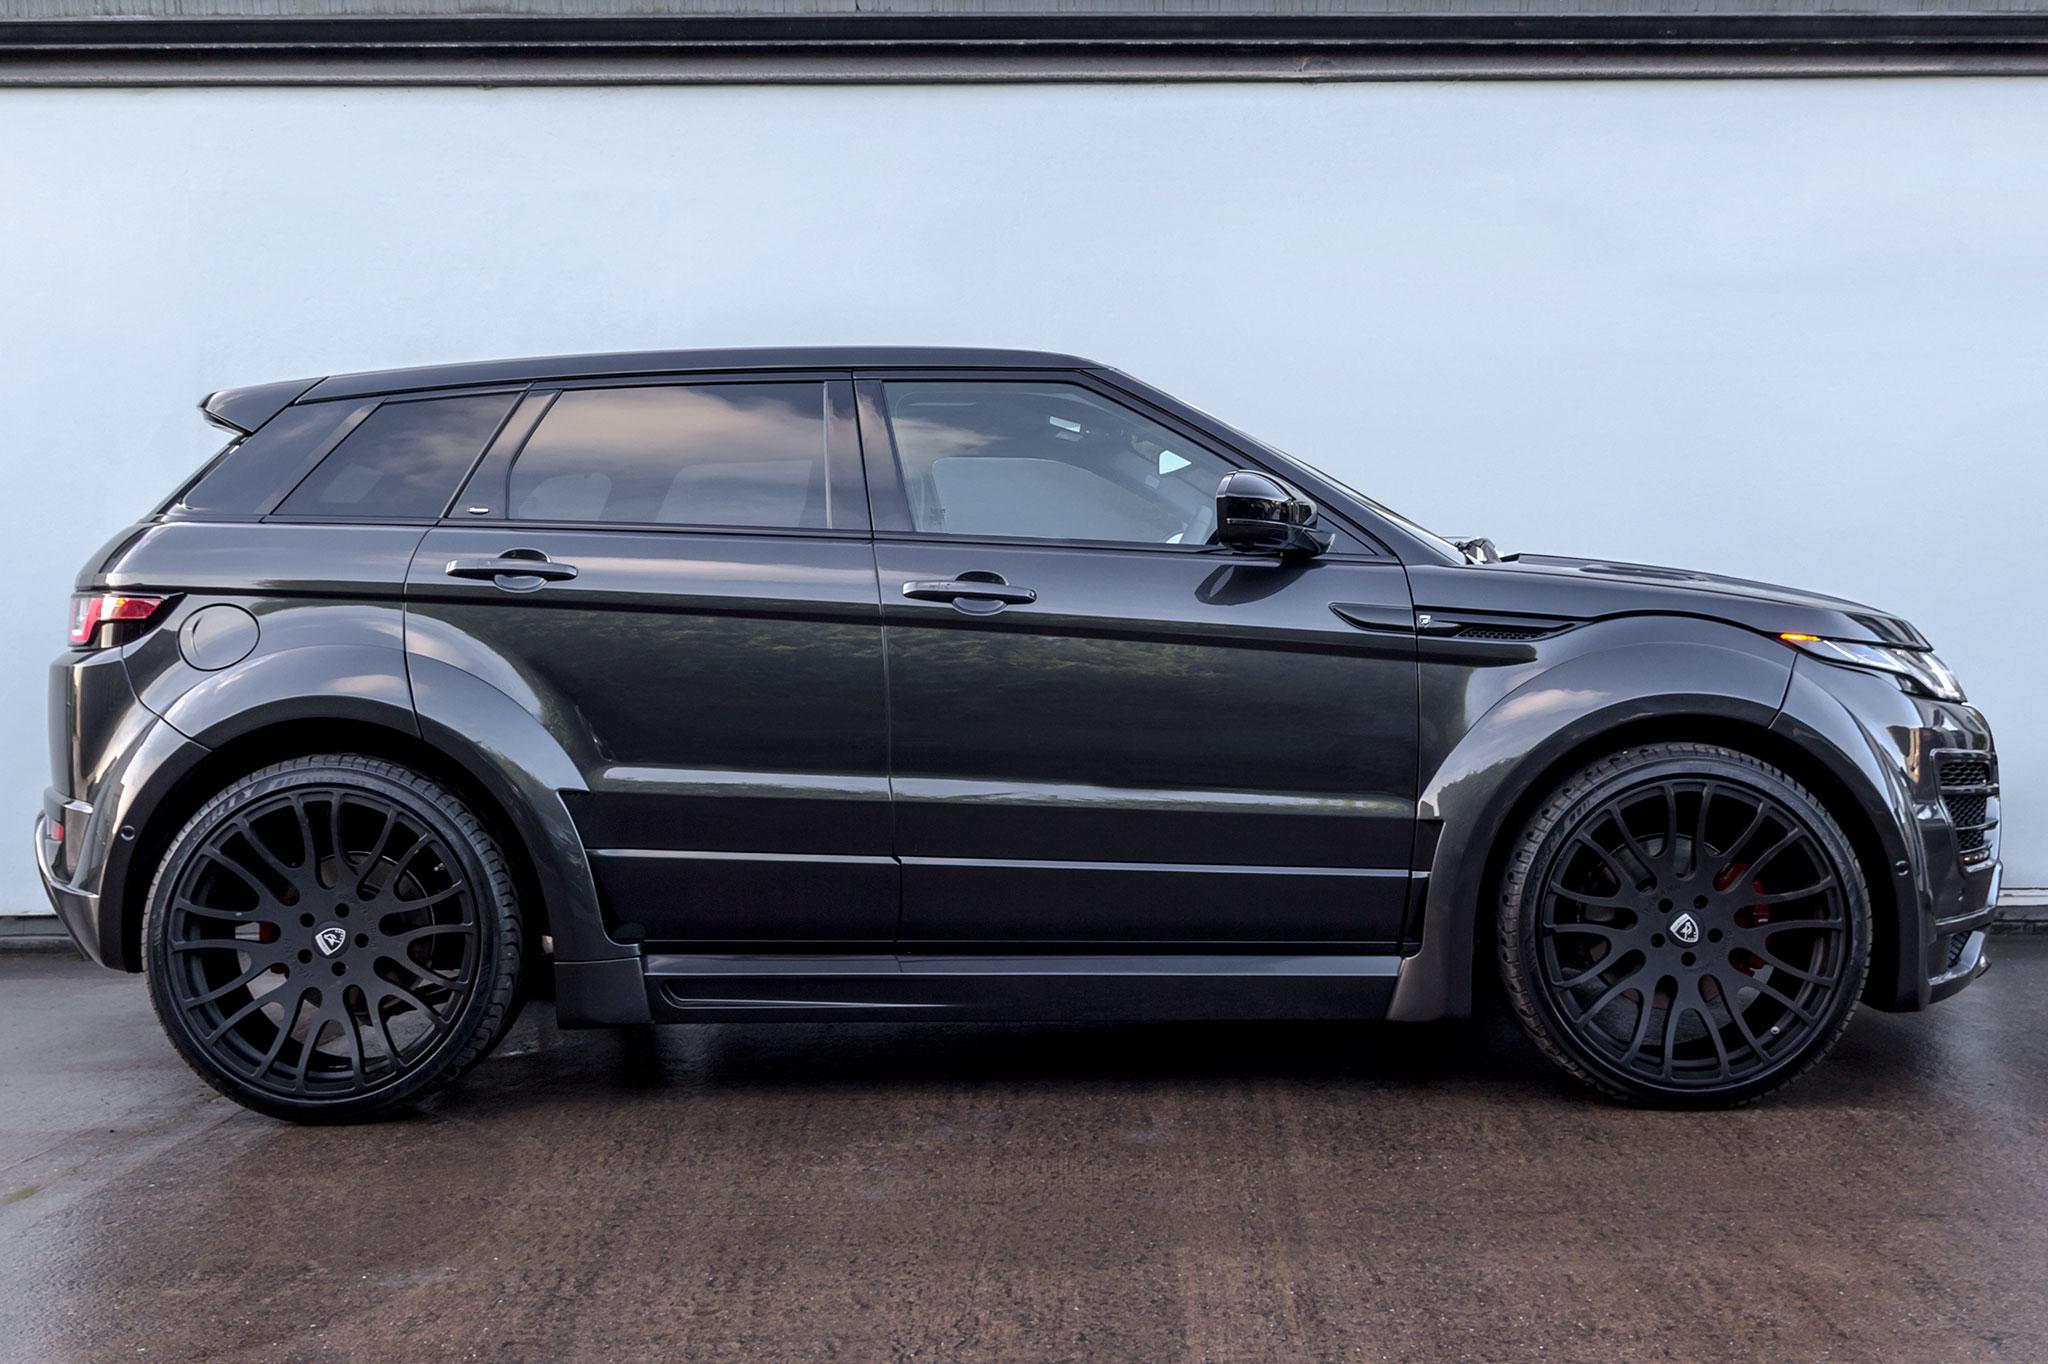 Range Rover Evoque Price >> Hamann Range Rover Evoque 5 Door Widebody